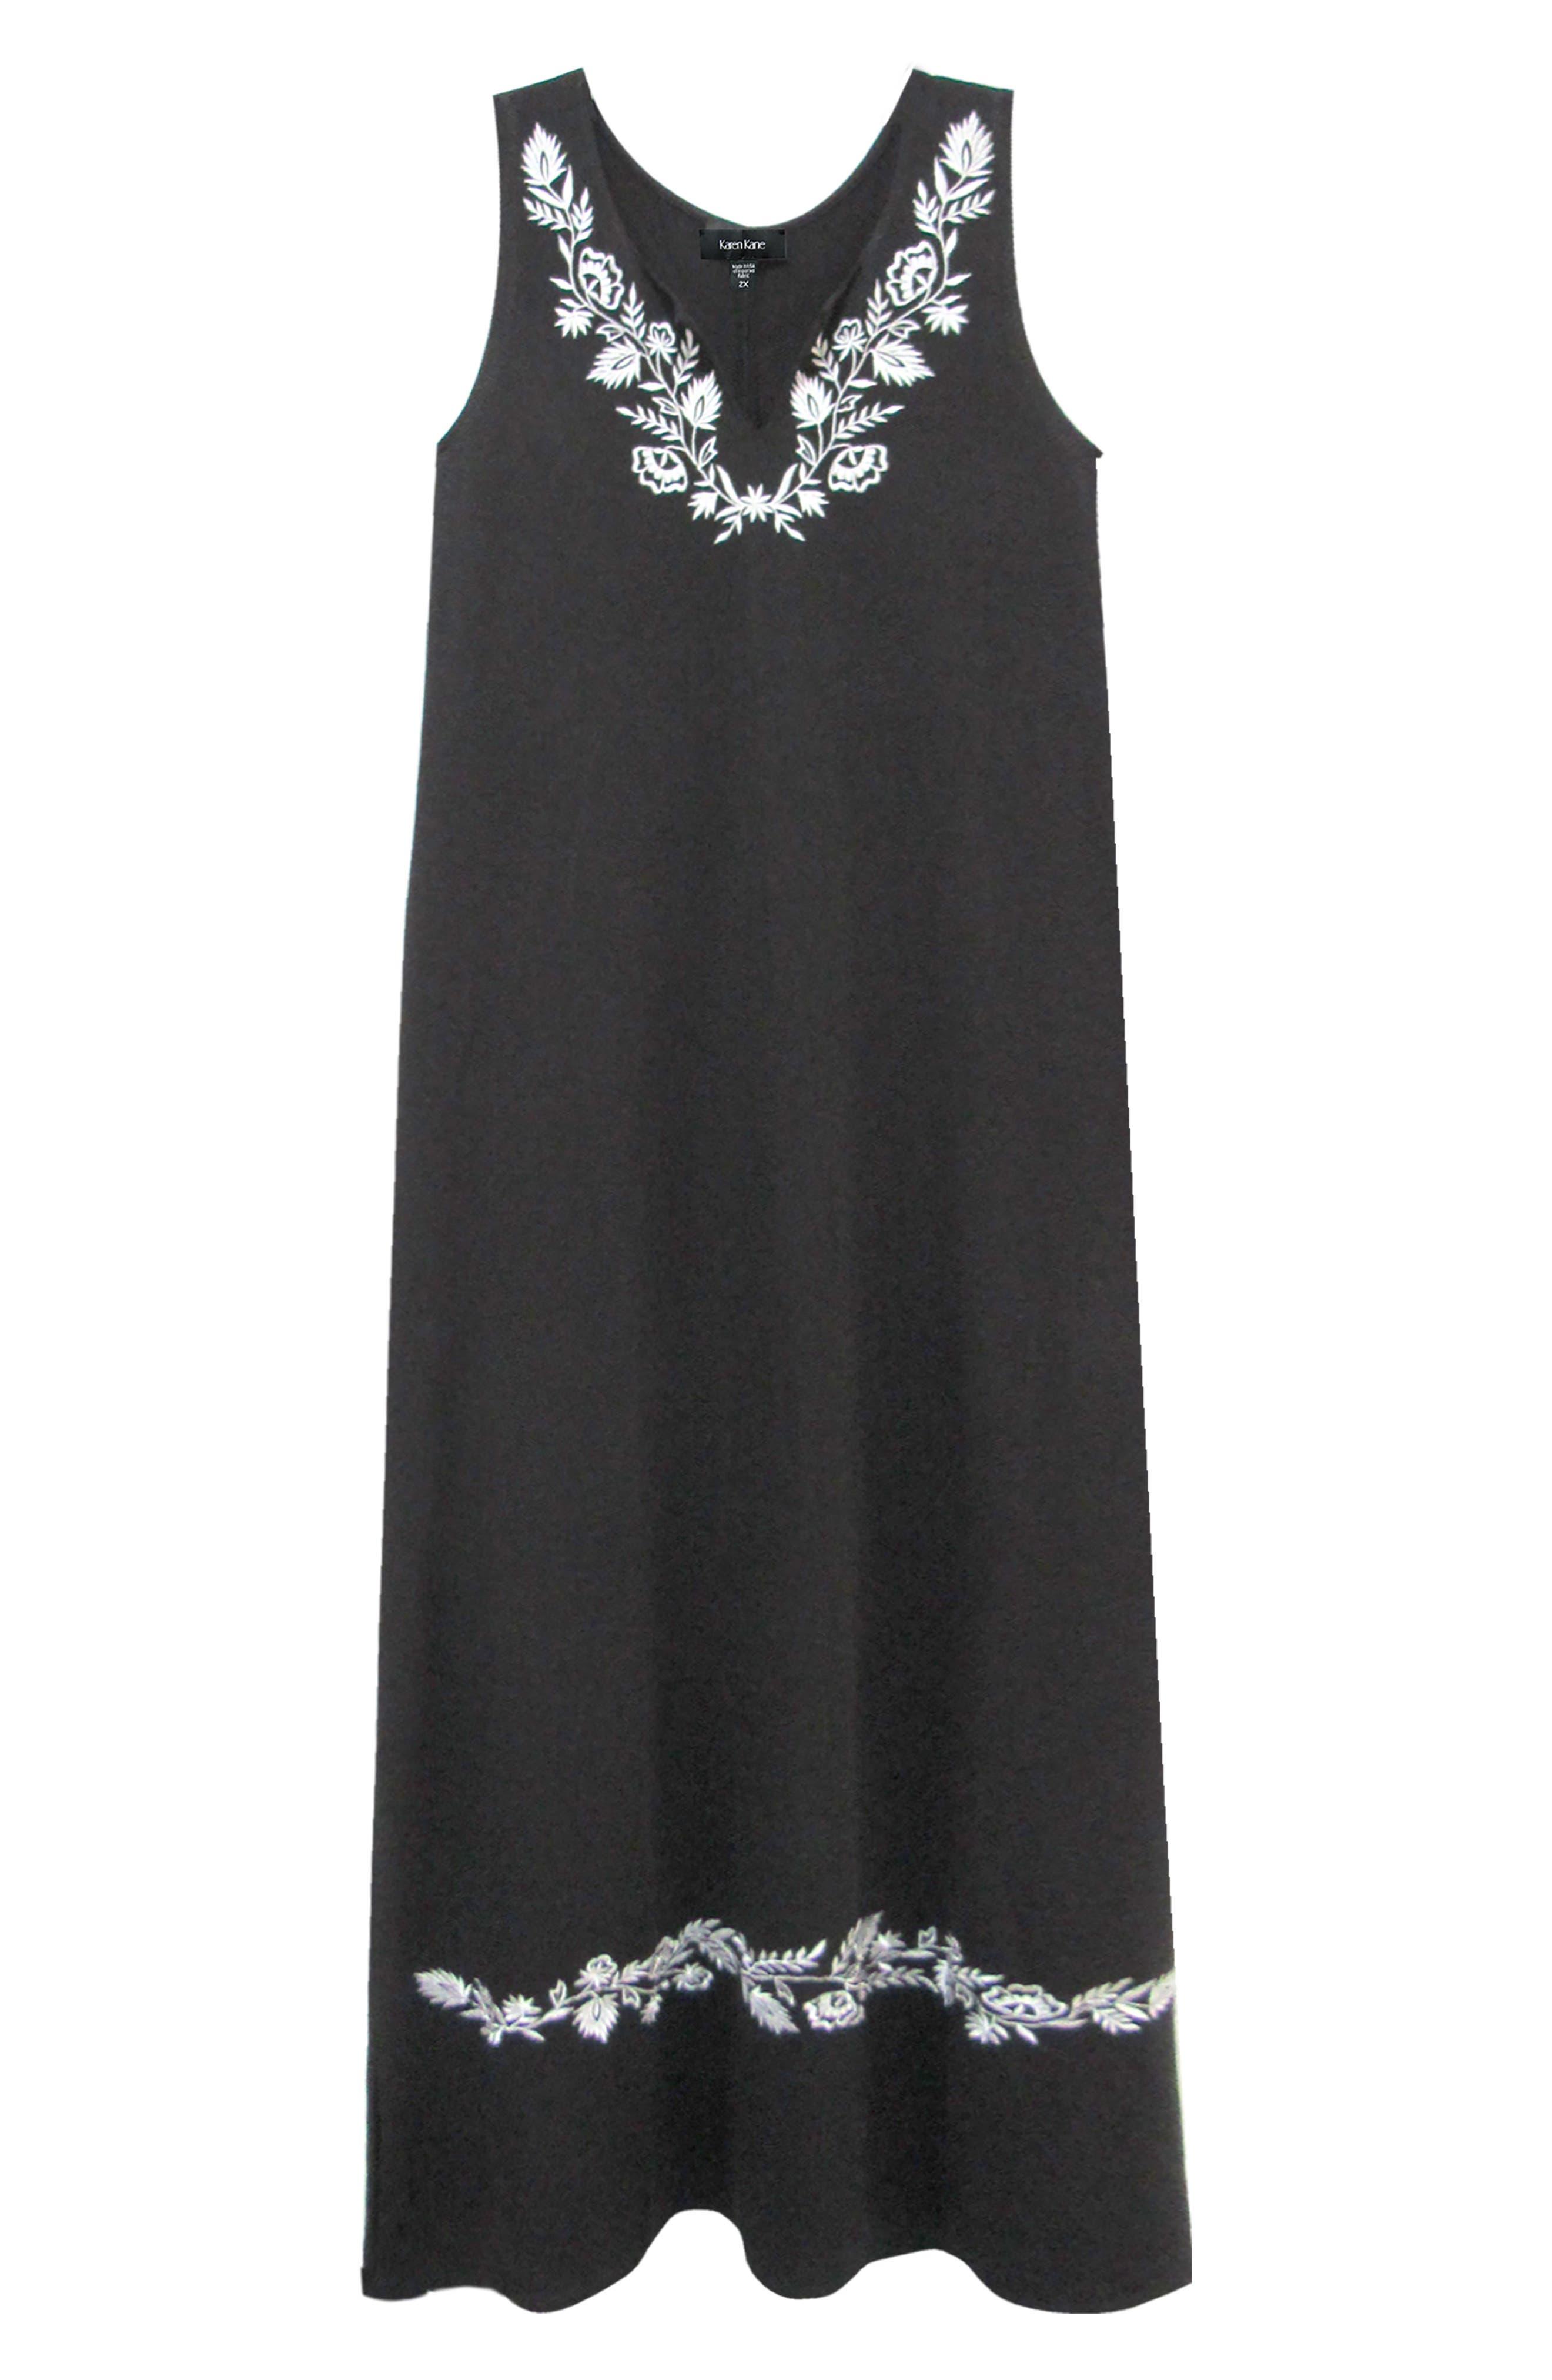 KAREN KANE, Embroidered Maxi Dress, Alternate thumbnail 3, color, BLACK